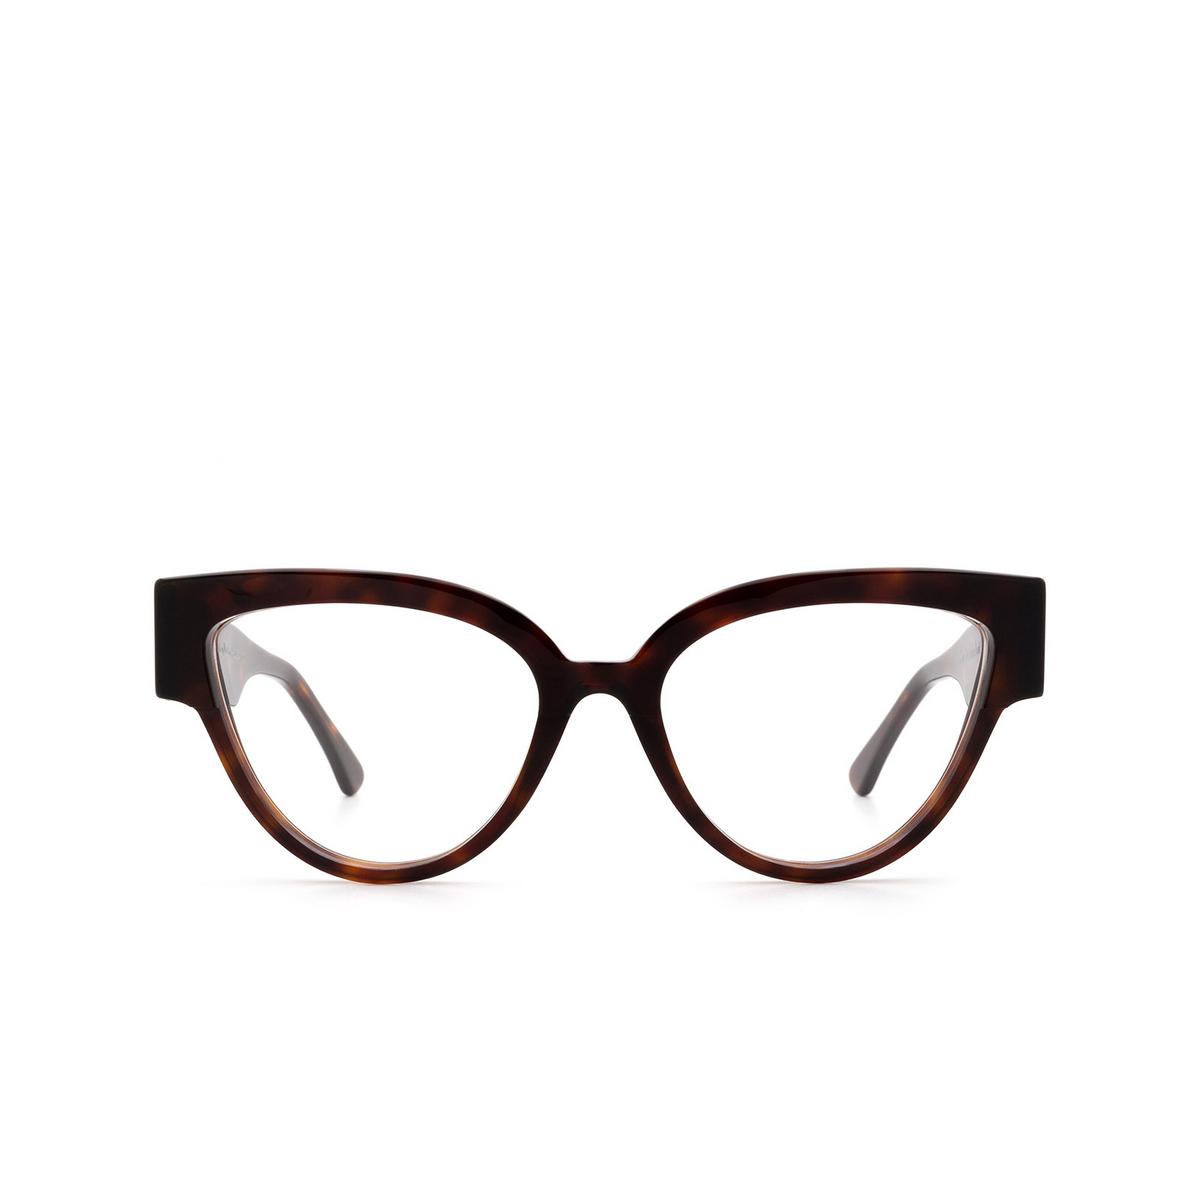 Ahlem® Butterfly Eyeglasses: Rue De Sofia Optic color Light Turtle.